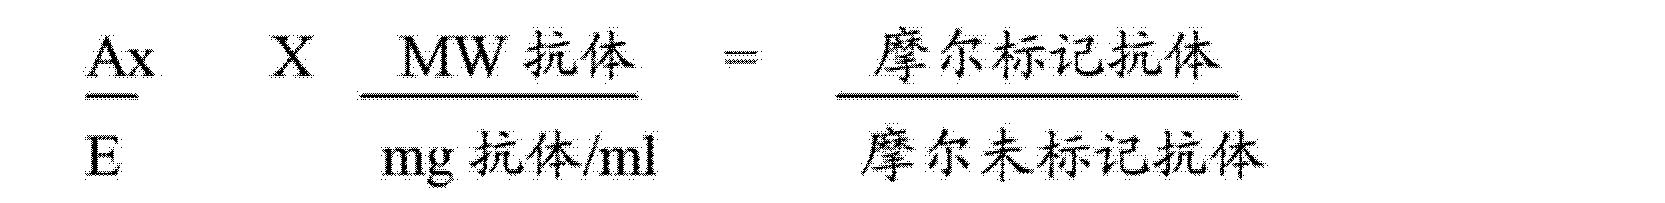 Figure CN103880955AD00751